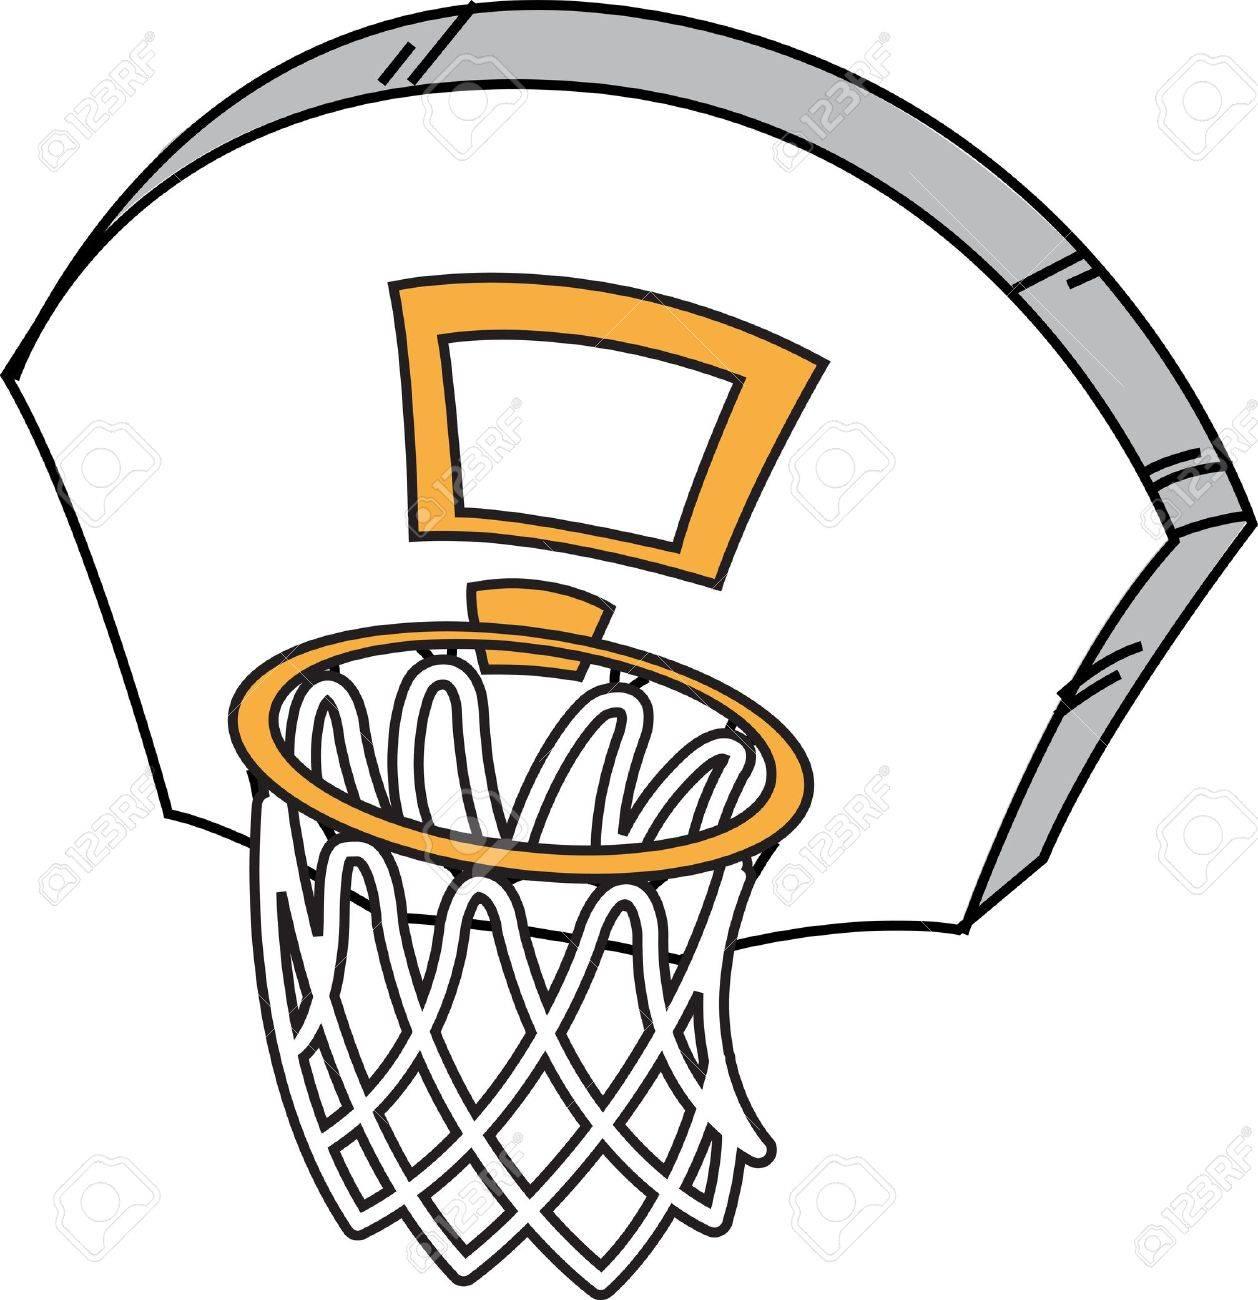 1258x1300 Cartoon Basketball Hoop, Net And Backboard Royalty Free Cliparts